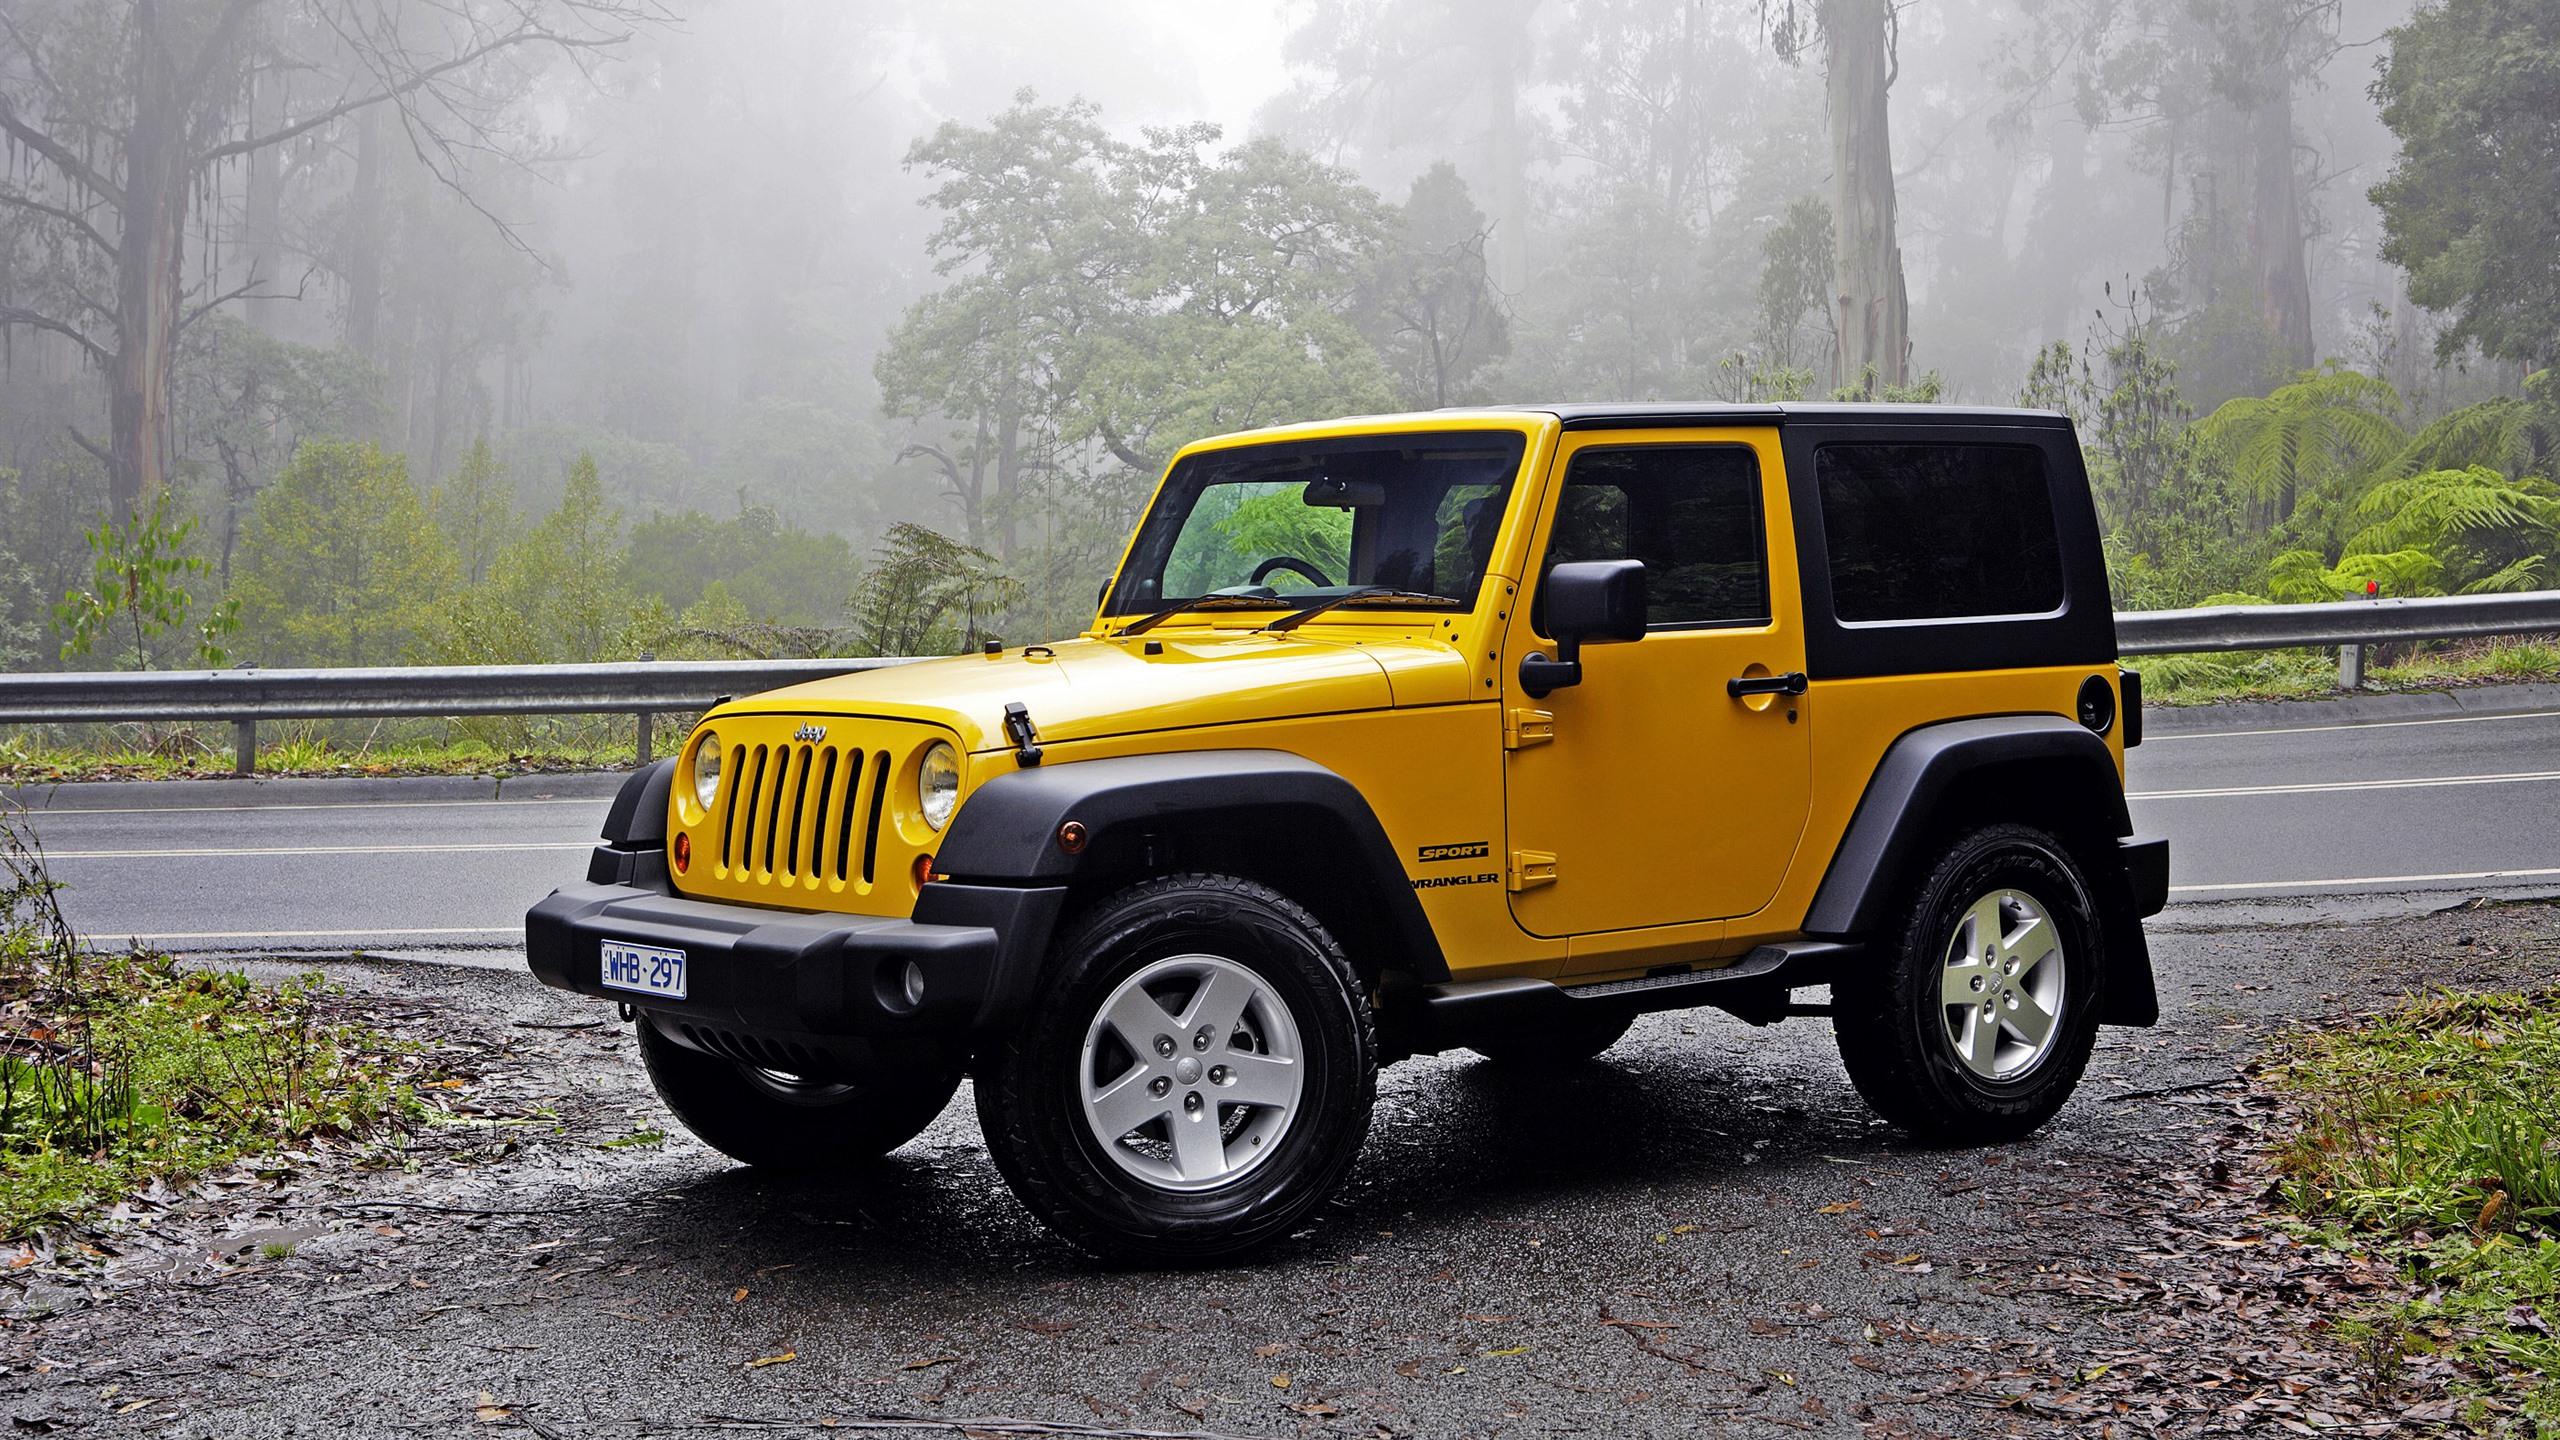 Jeep Wrangler Yellow Car 828x1792 Iphone Xr Wallpaper